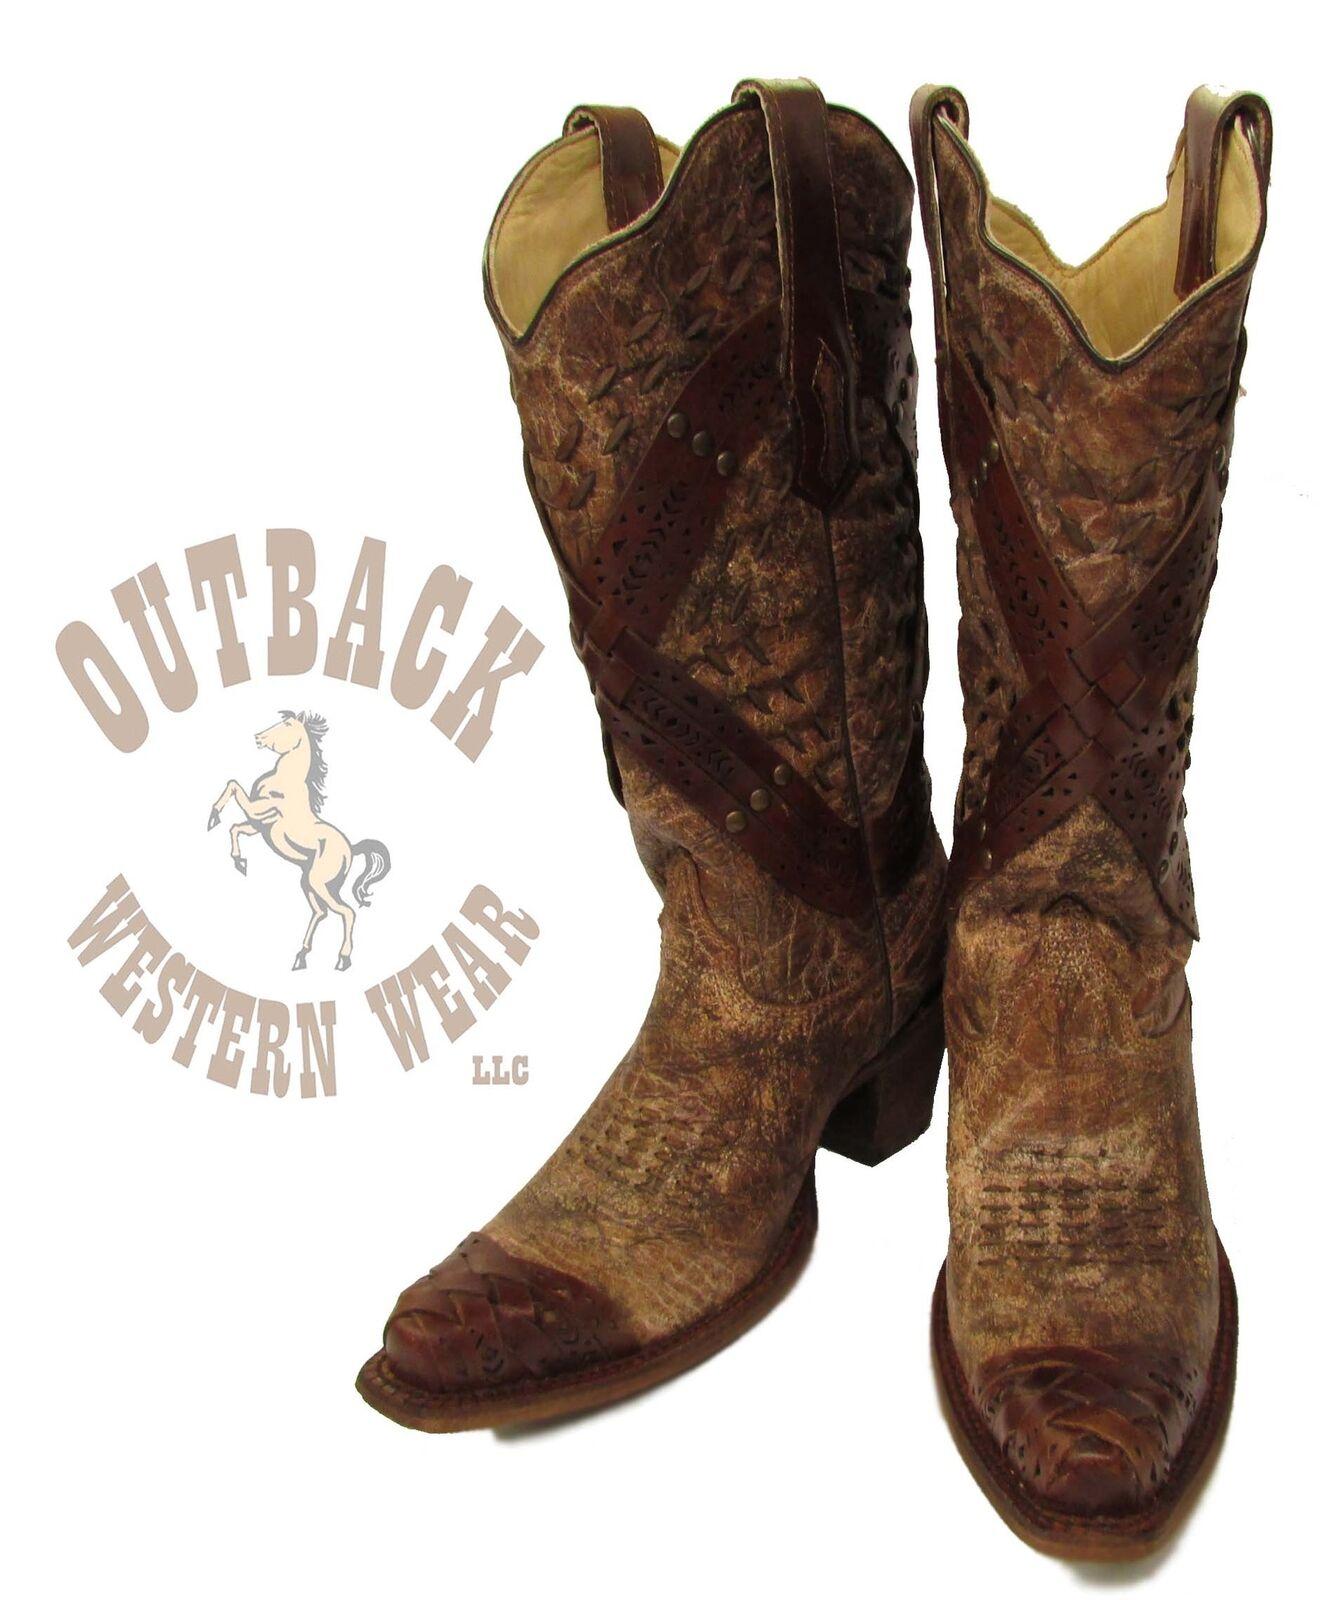 SALE! Corral Women's Cognac Crossed Strap & Studs Snip Toe Boots A2990